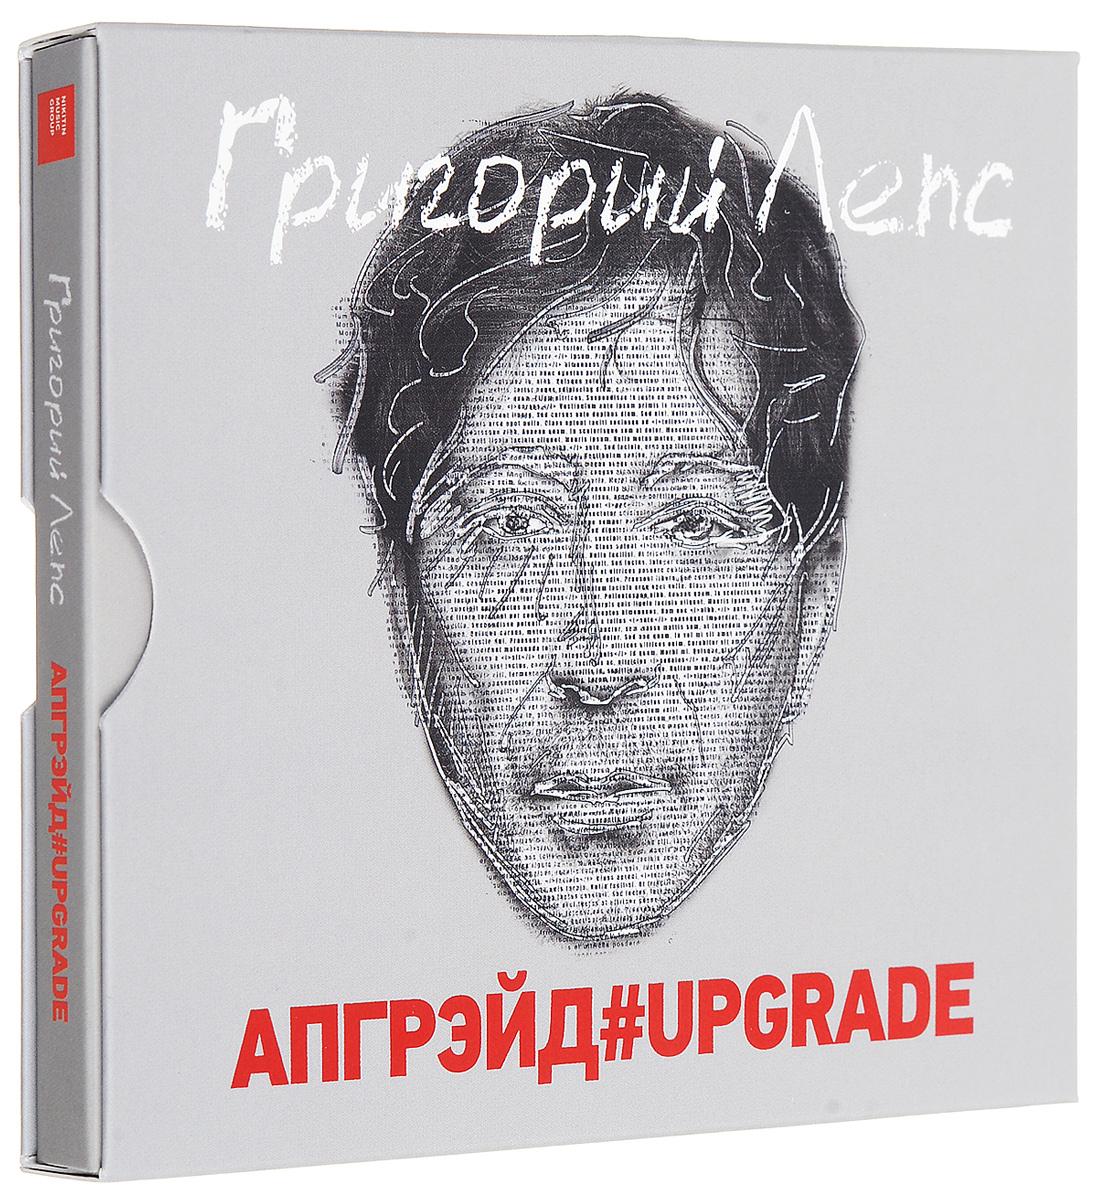 Григорий Лепс Григорий Лепс. Апгрэйд#Upgrade (2 CD) cd григорий лепс ты чего такой серьезный